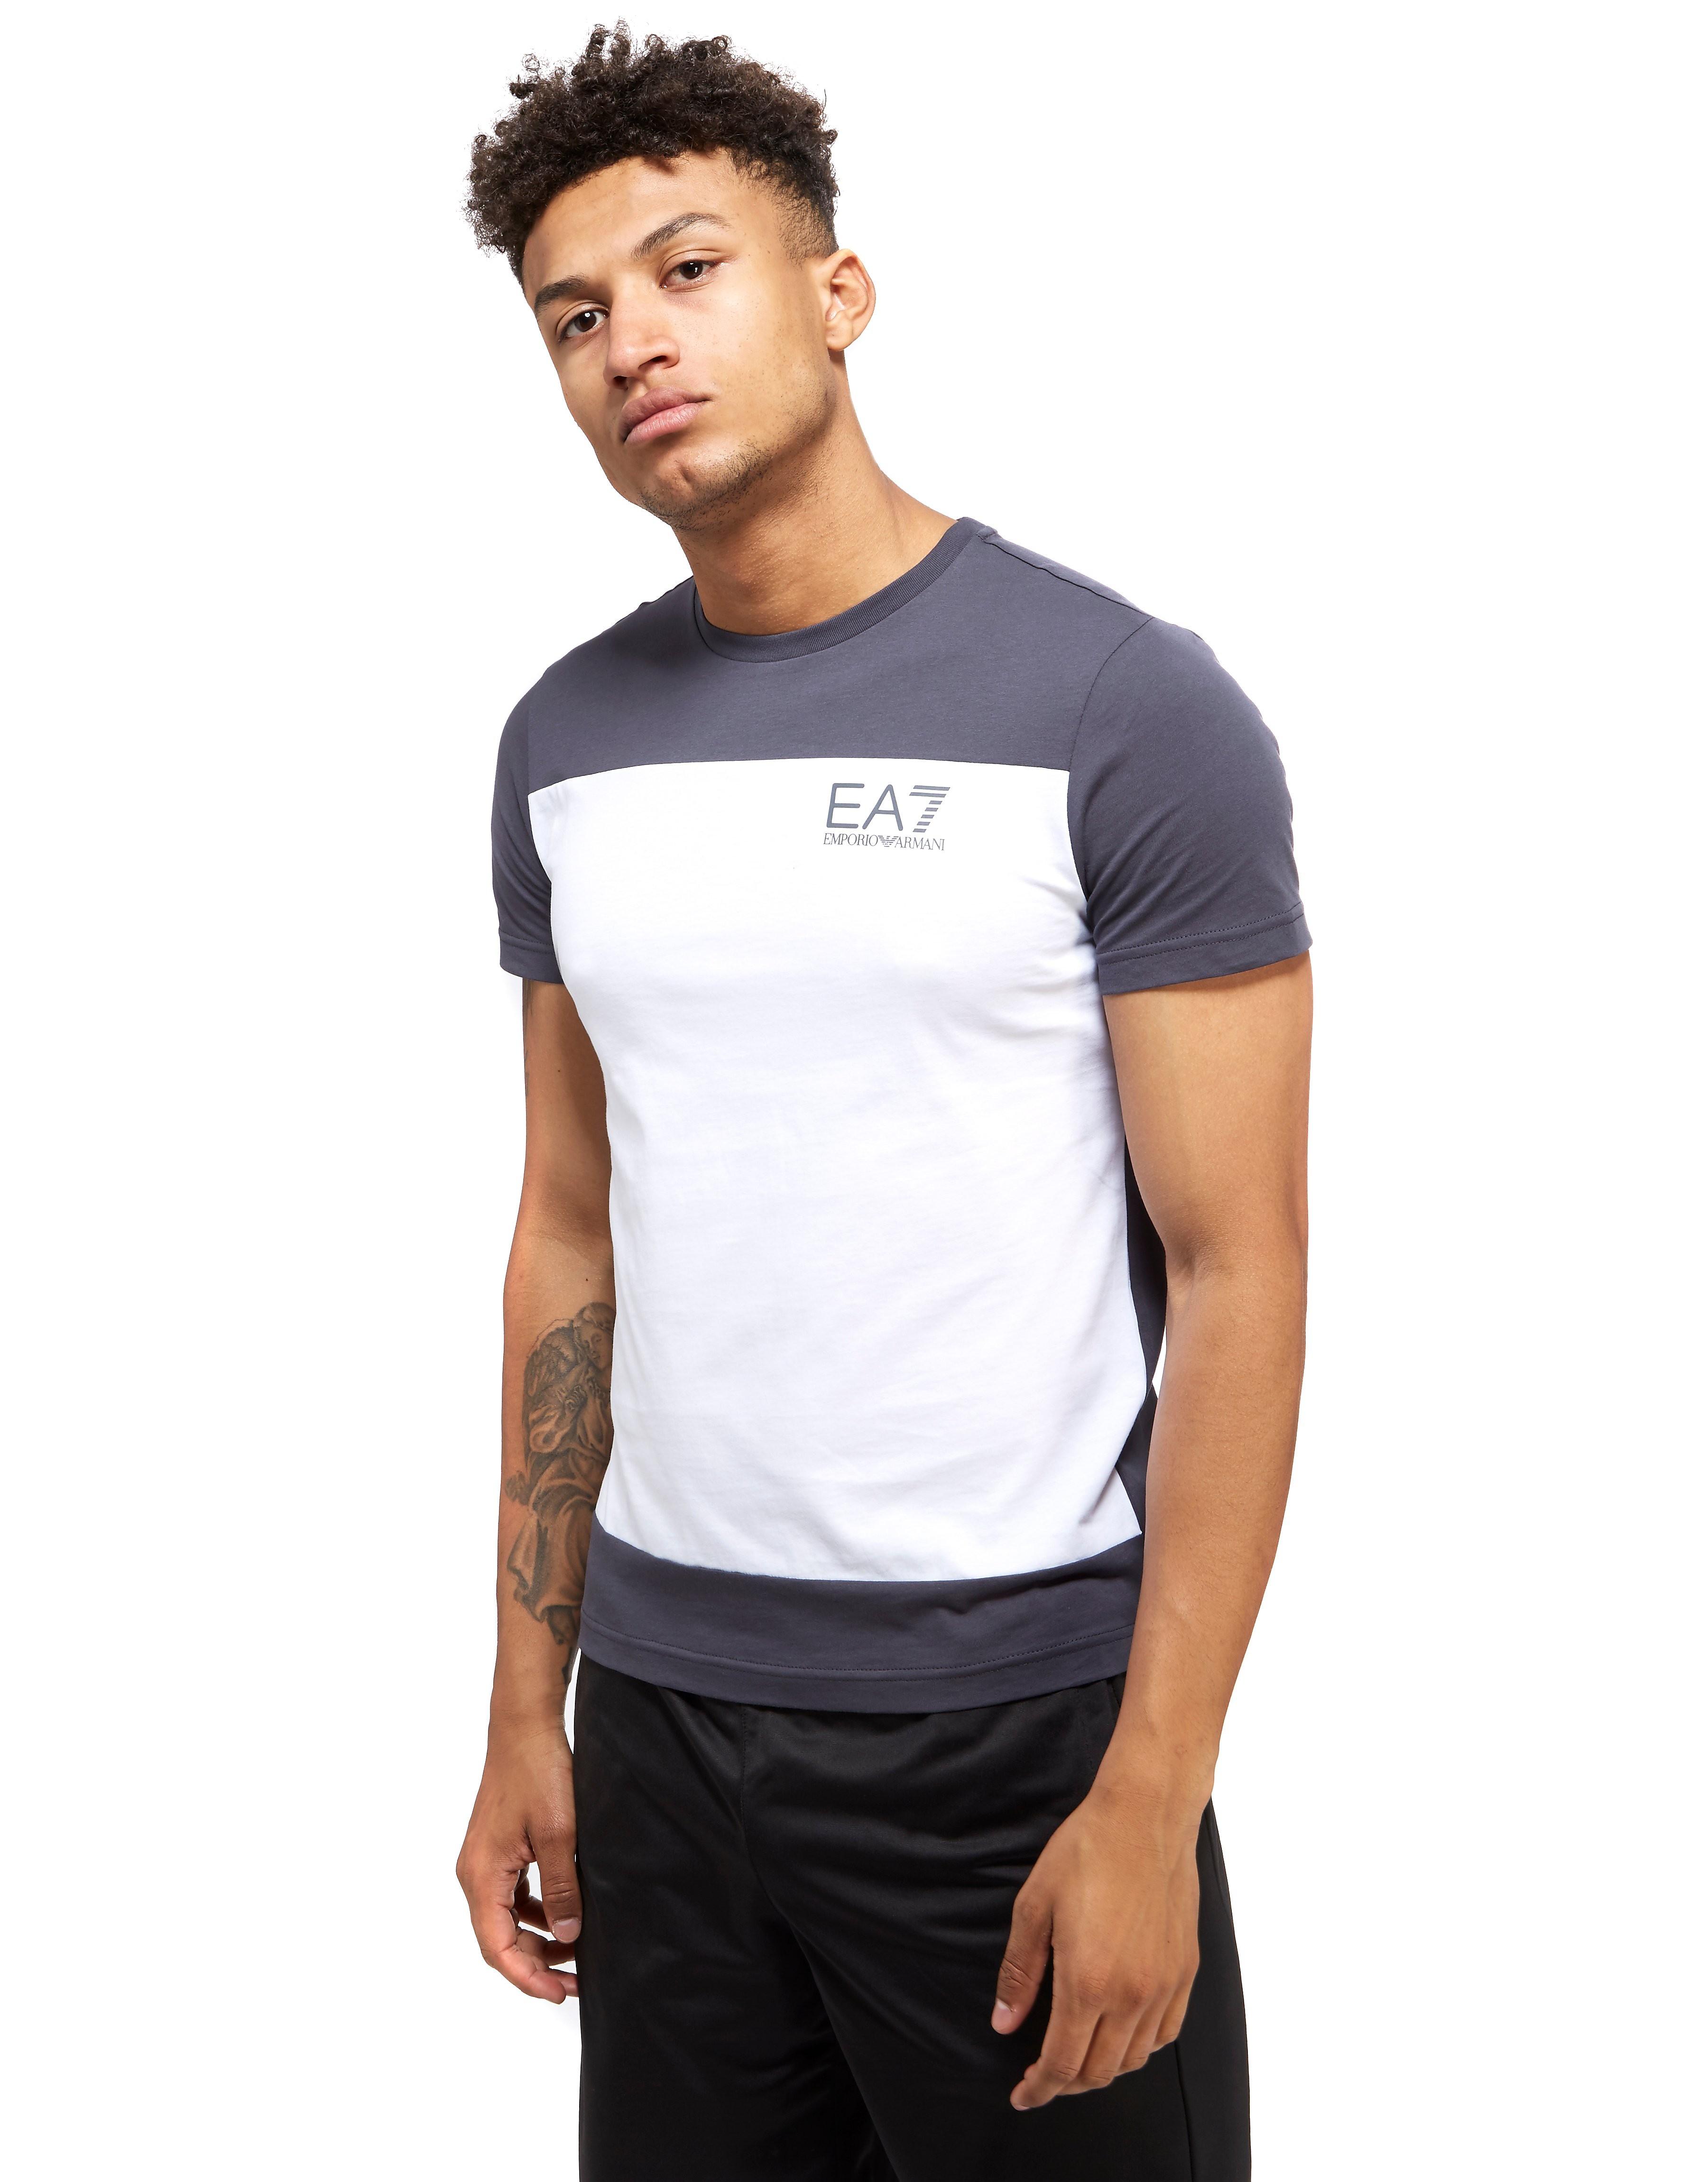 Emporio Armani EA7 Carbon Block T-Shirt